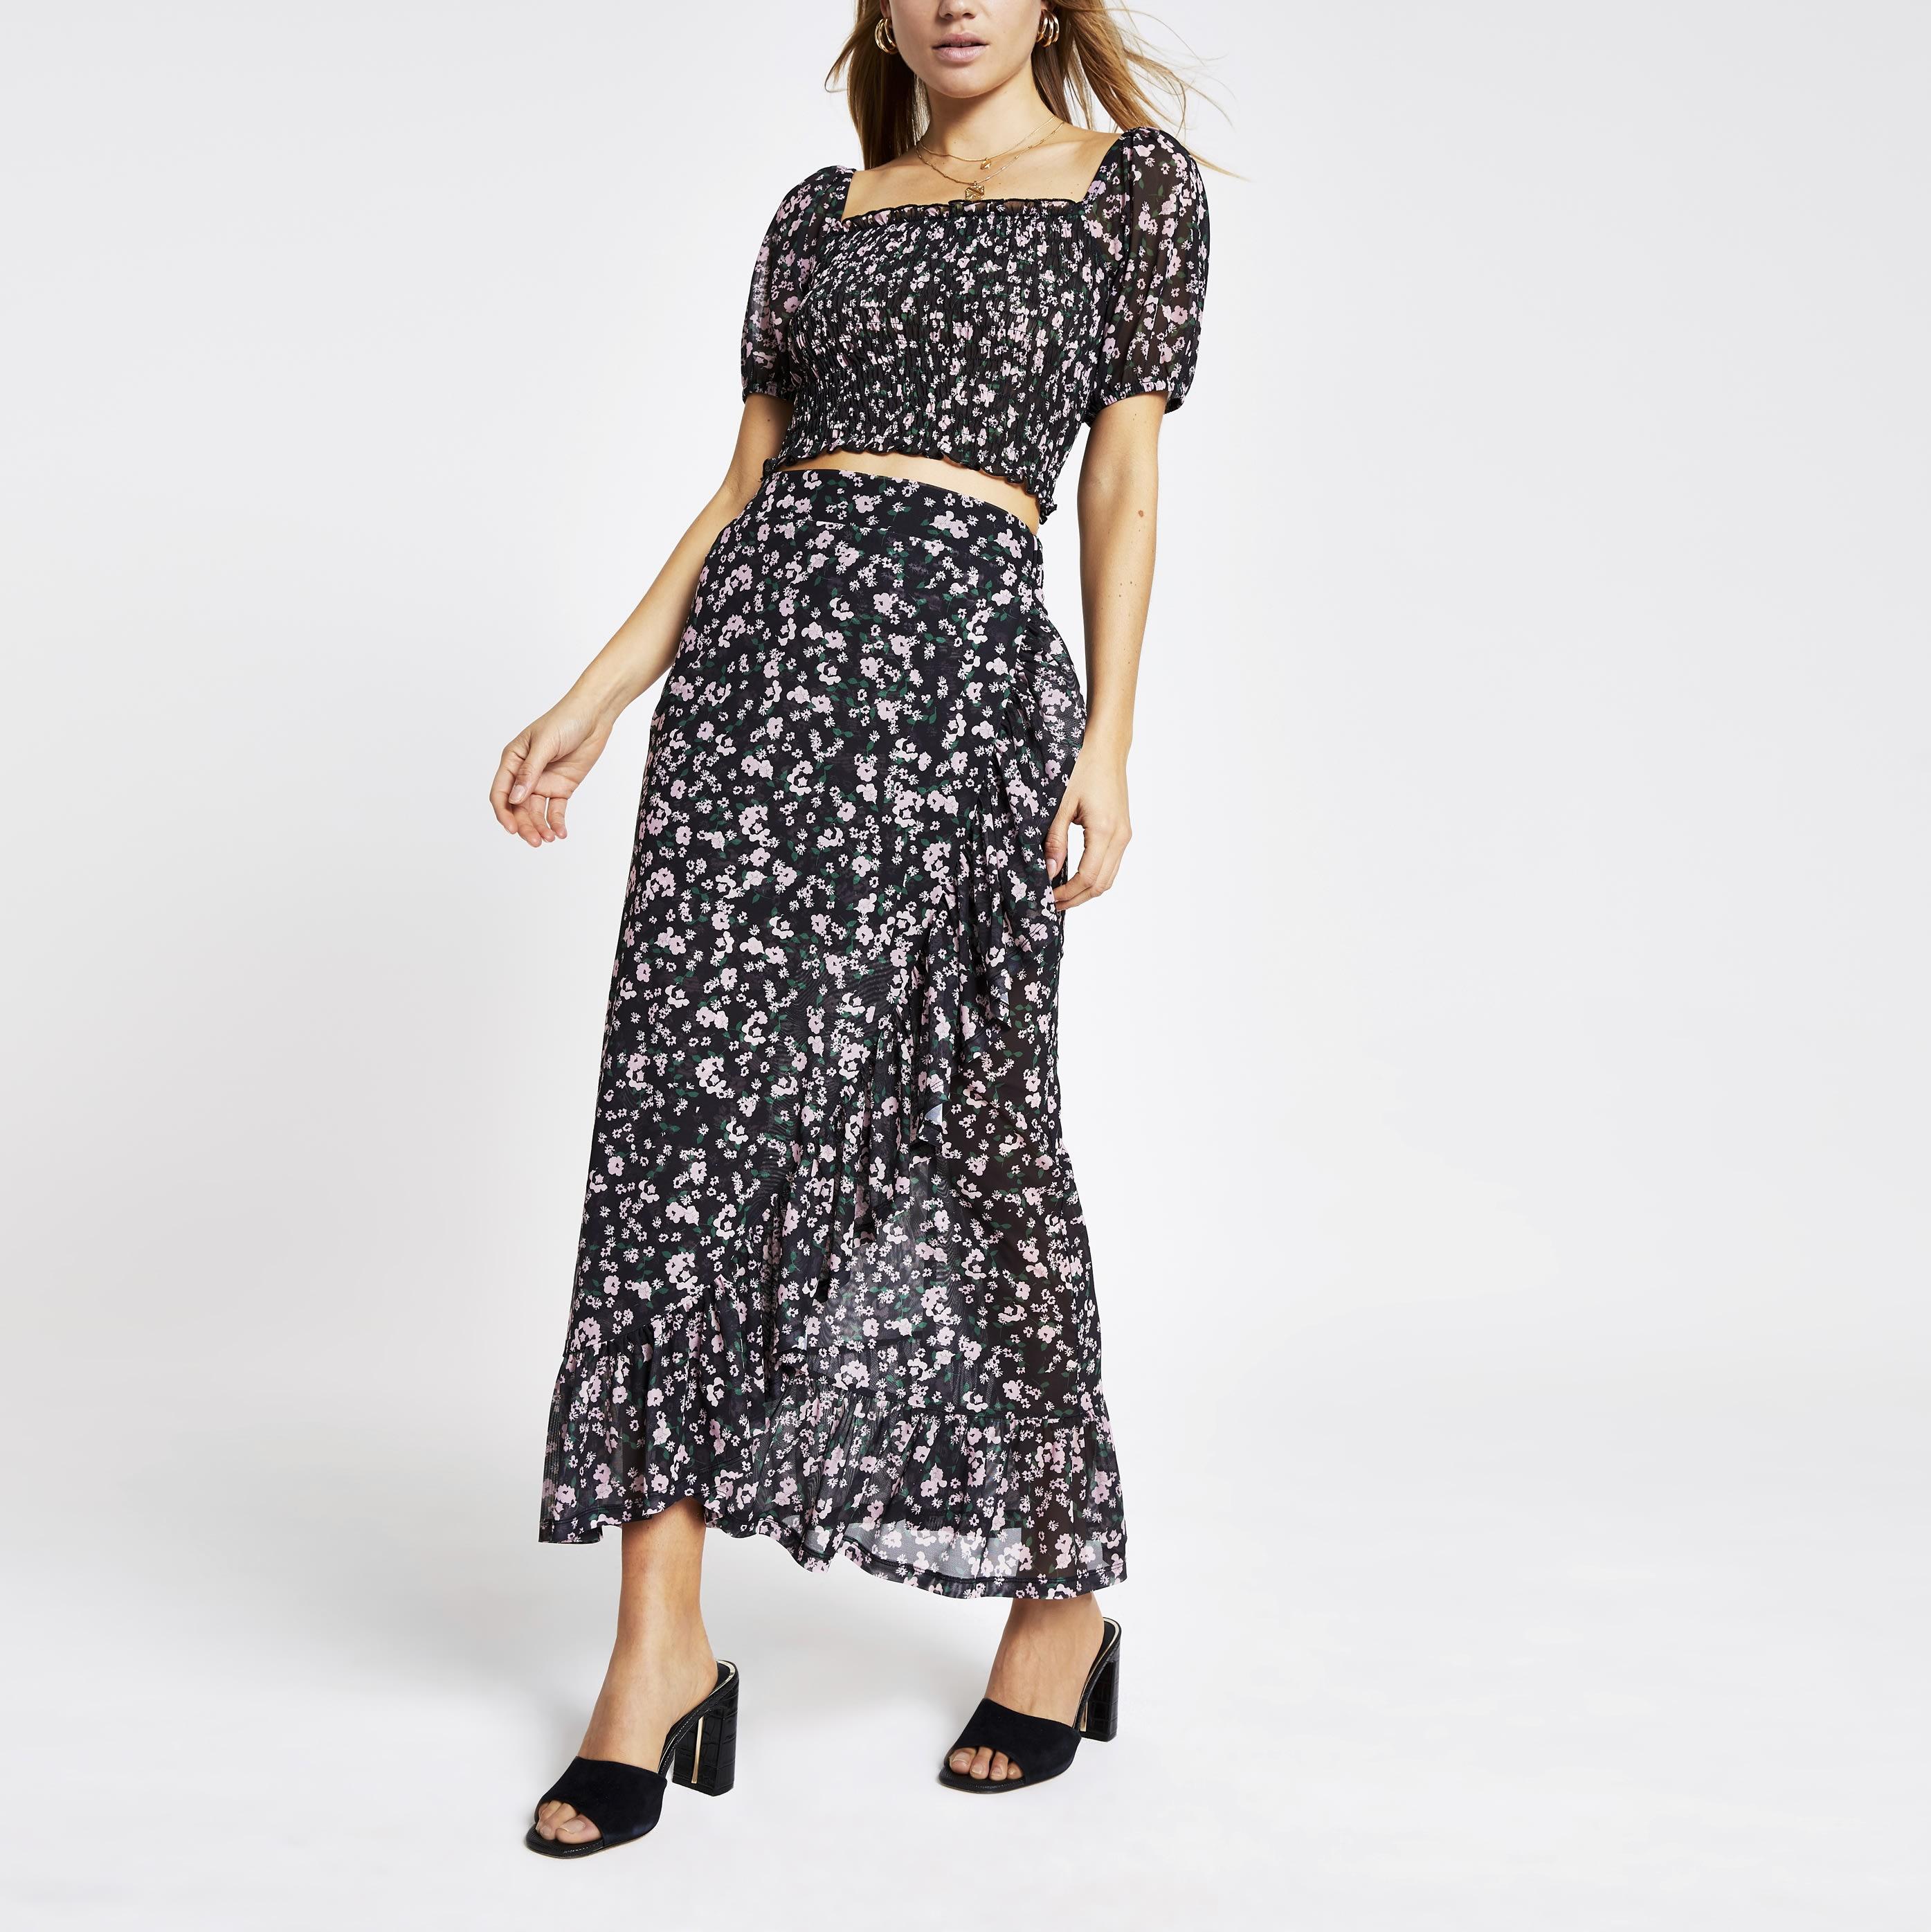 ee75a3b7d249 Miss Selfridge Ditsy Floral Print Wrap Midi Skirt | Saddha